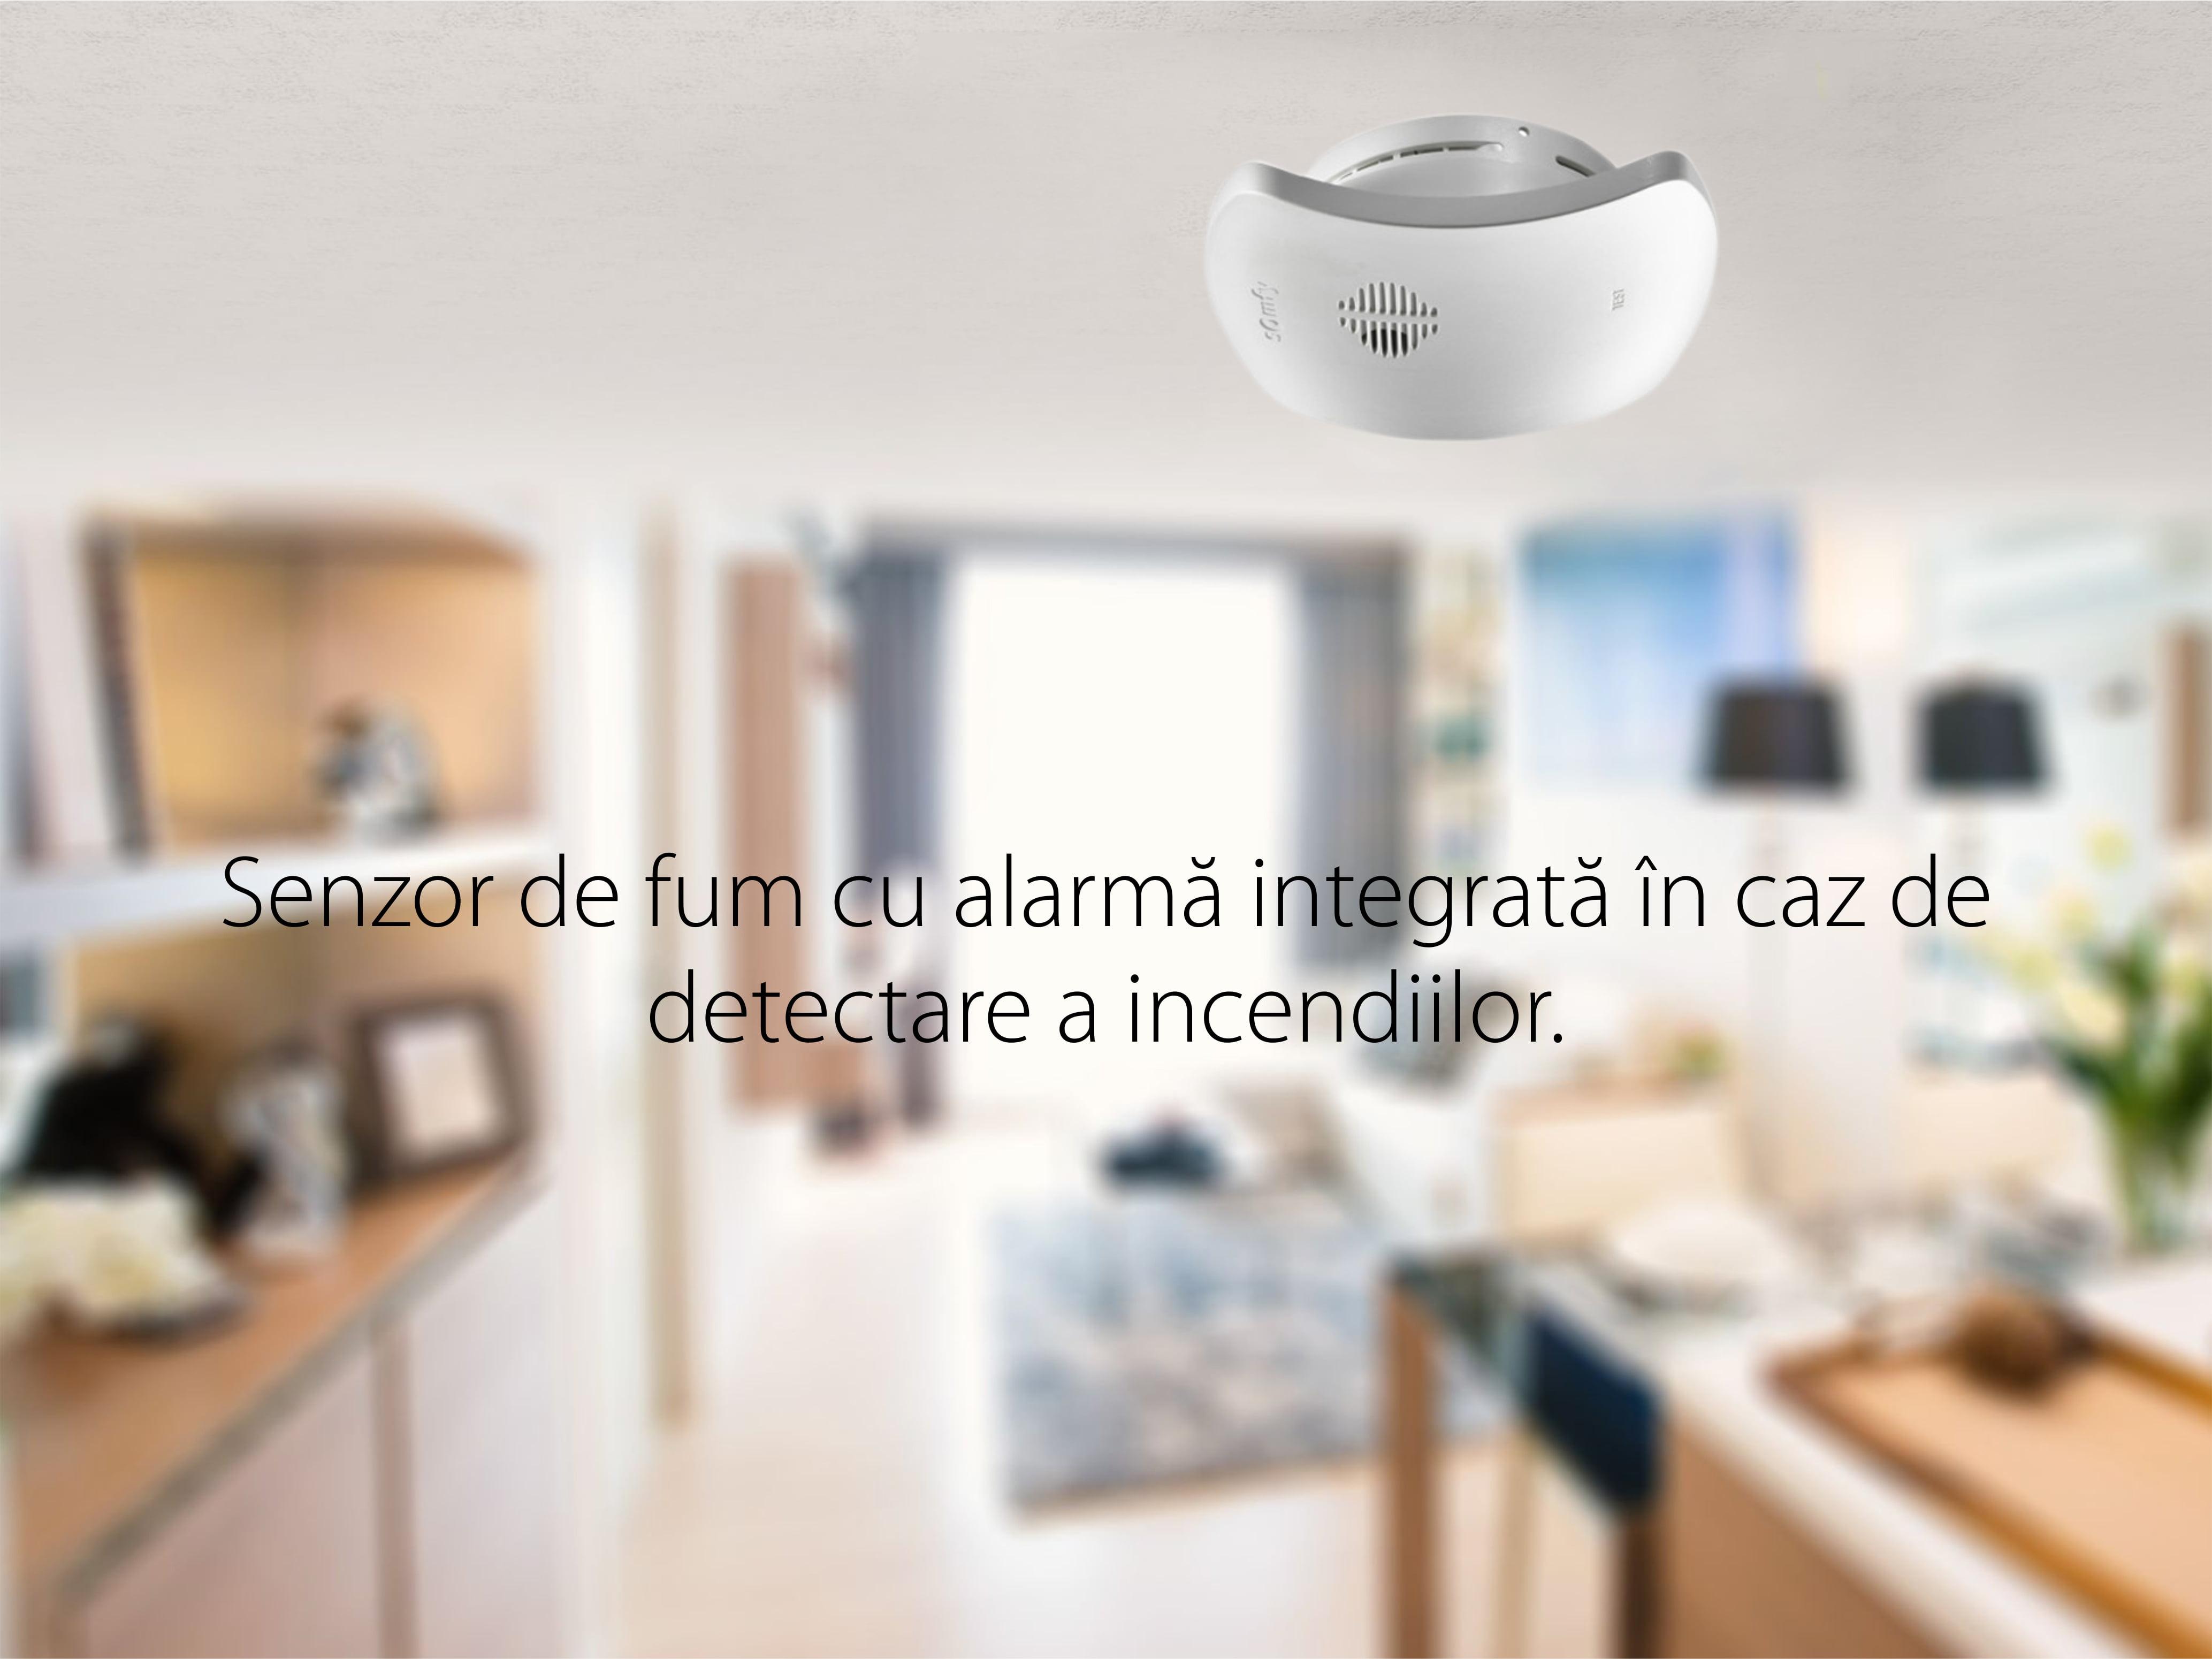 Senzor de fum TaHoma cu Alarma Integrata pentru Detectarea incendiilor, IP20, Frecventa radio 868-870 MHz 13